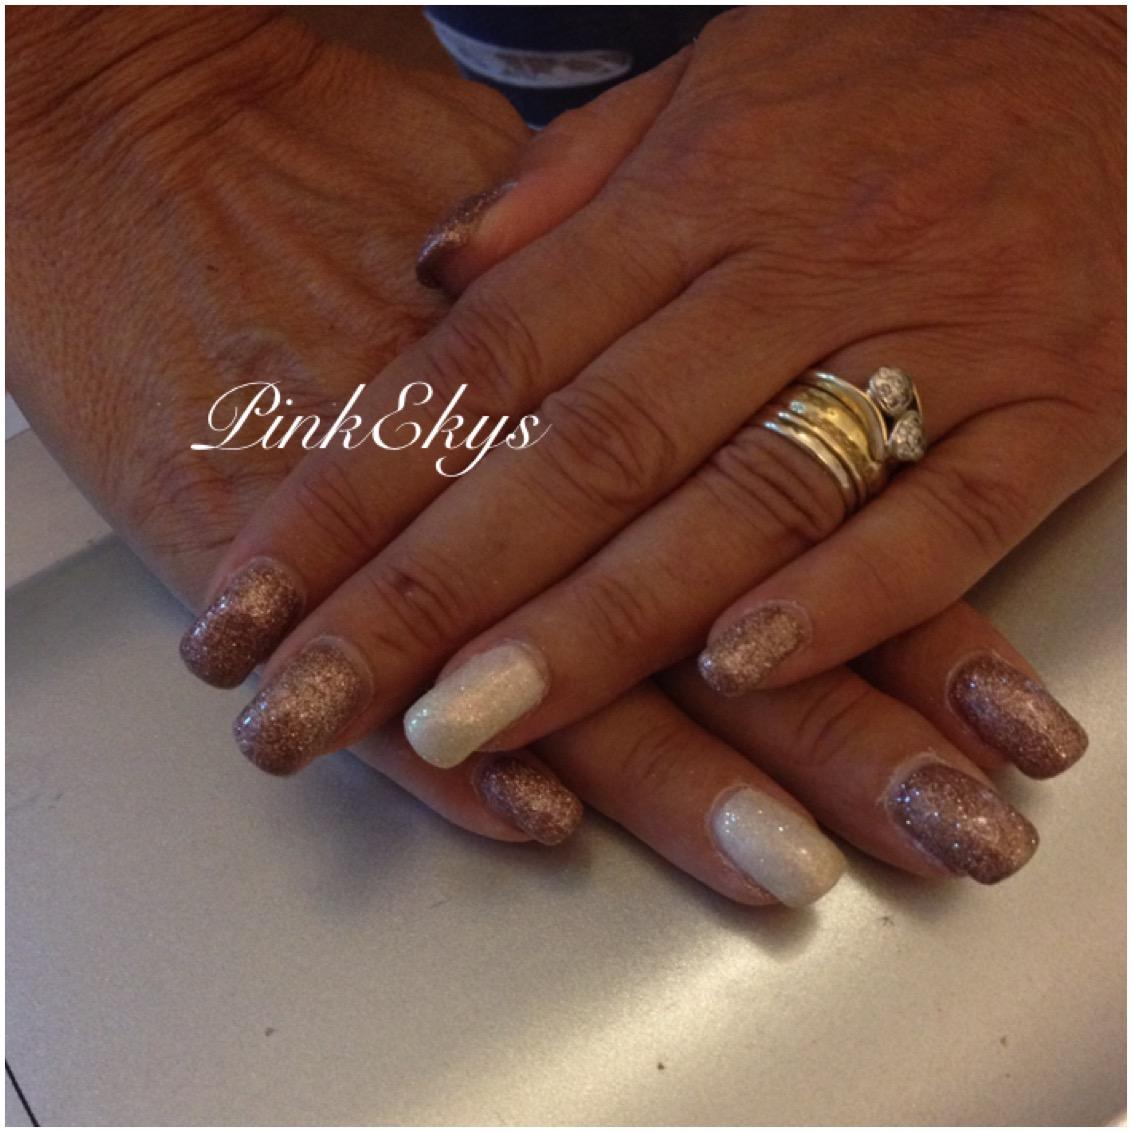 Pinkekys Unghie In Gel Glitter Autumn